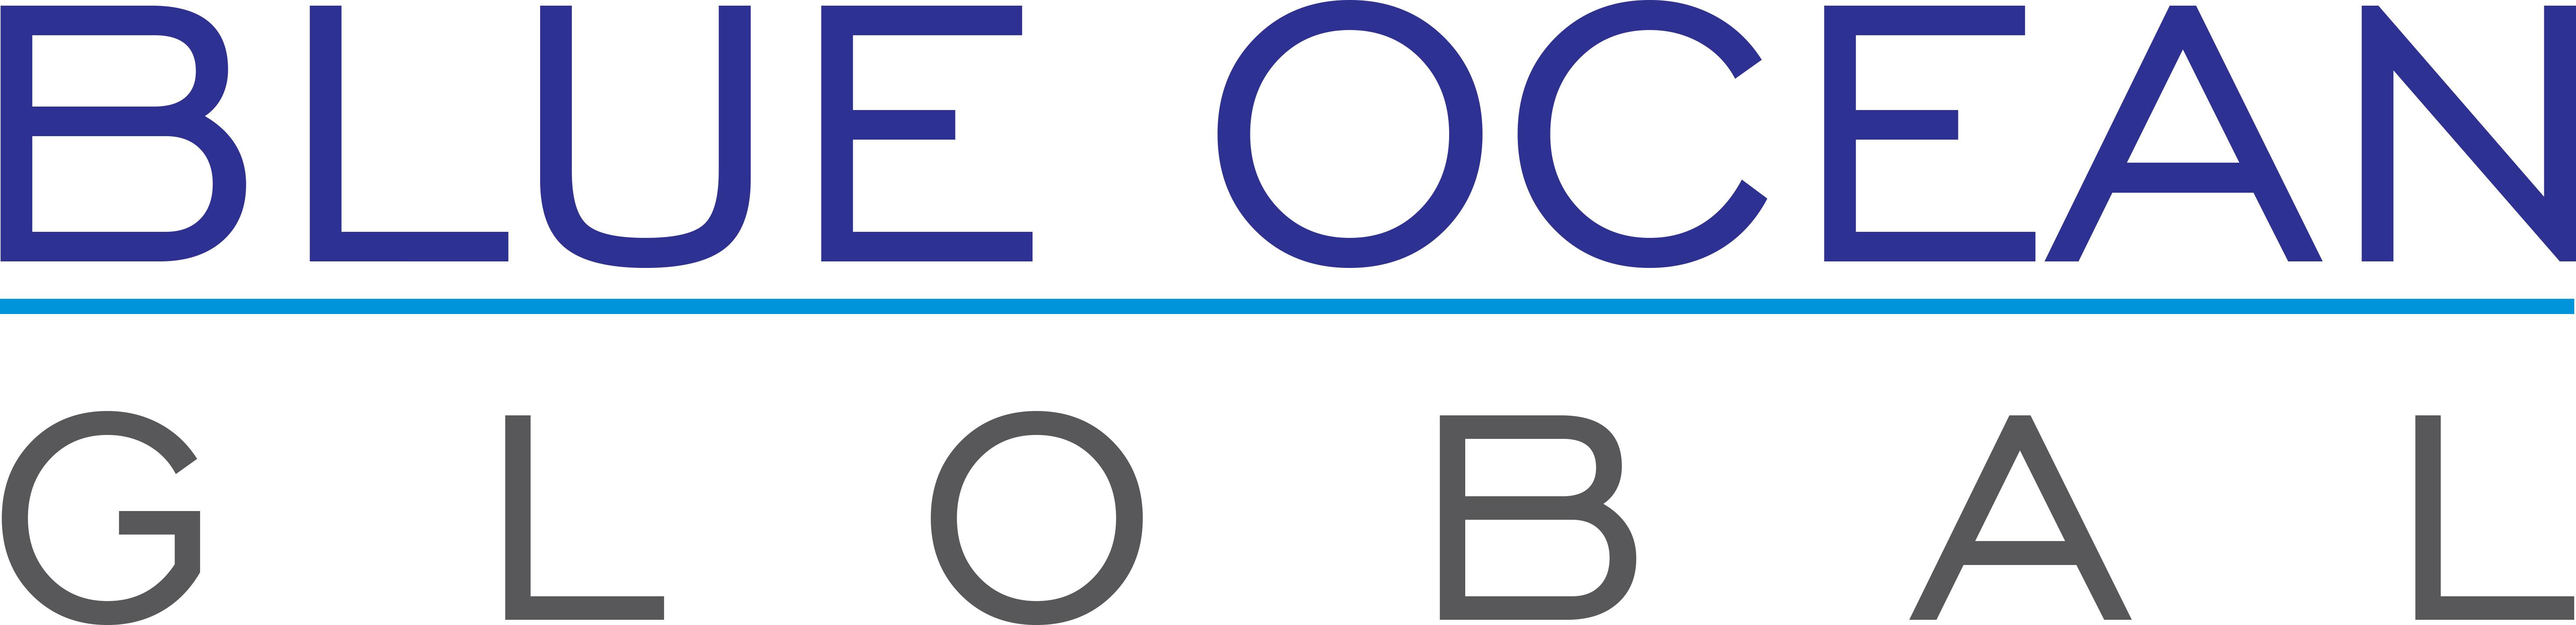 Blue Ocean Trading